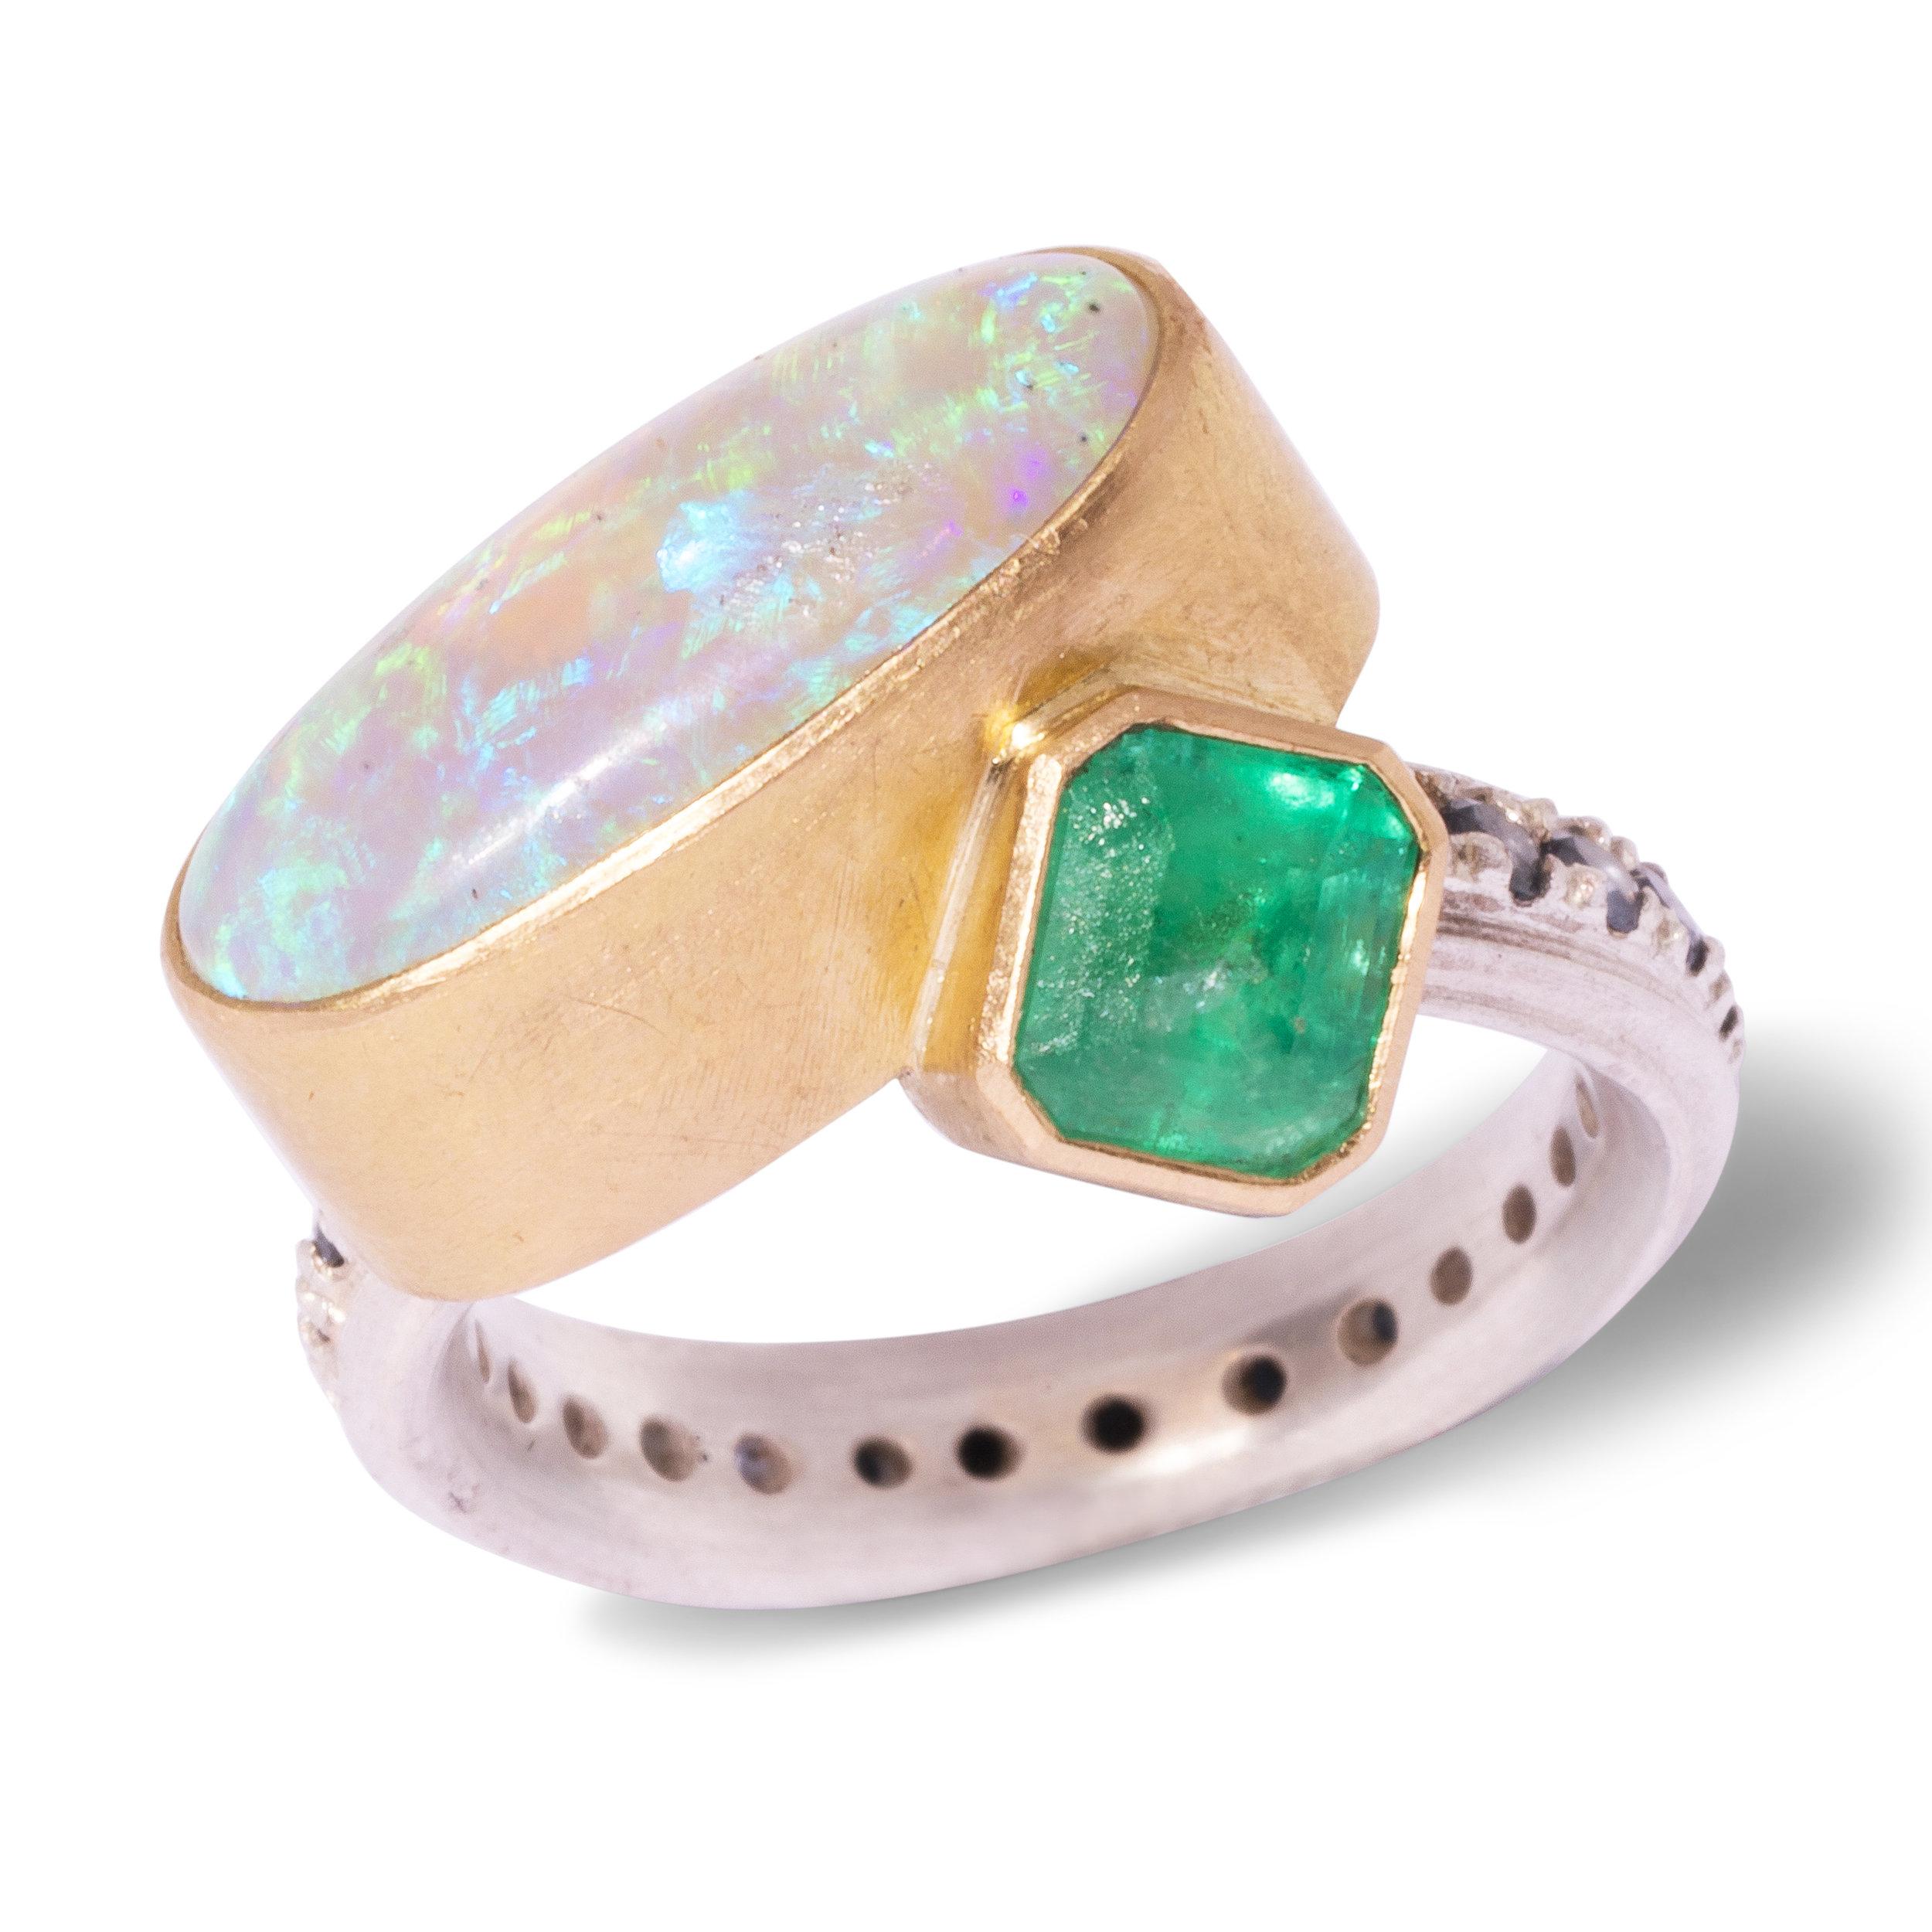 Chris Boland Opal & Emerald ring